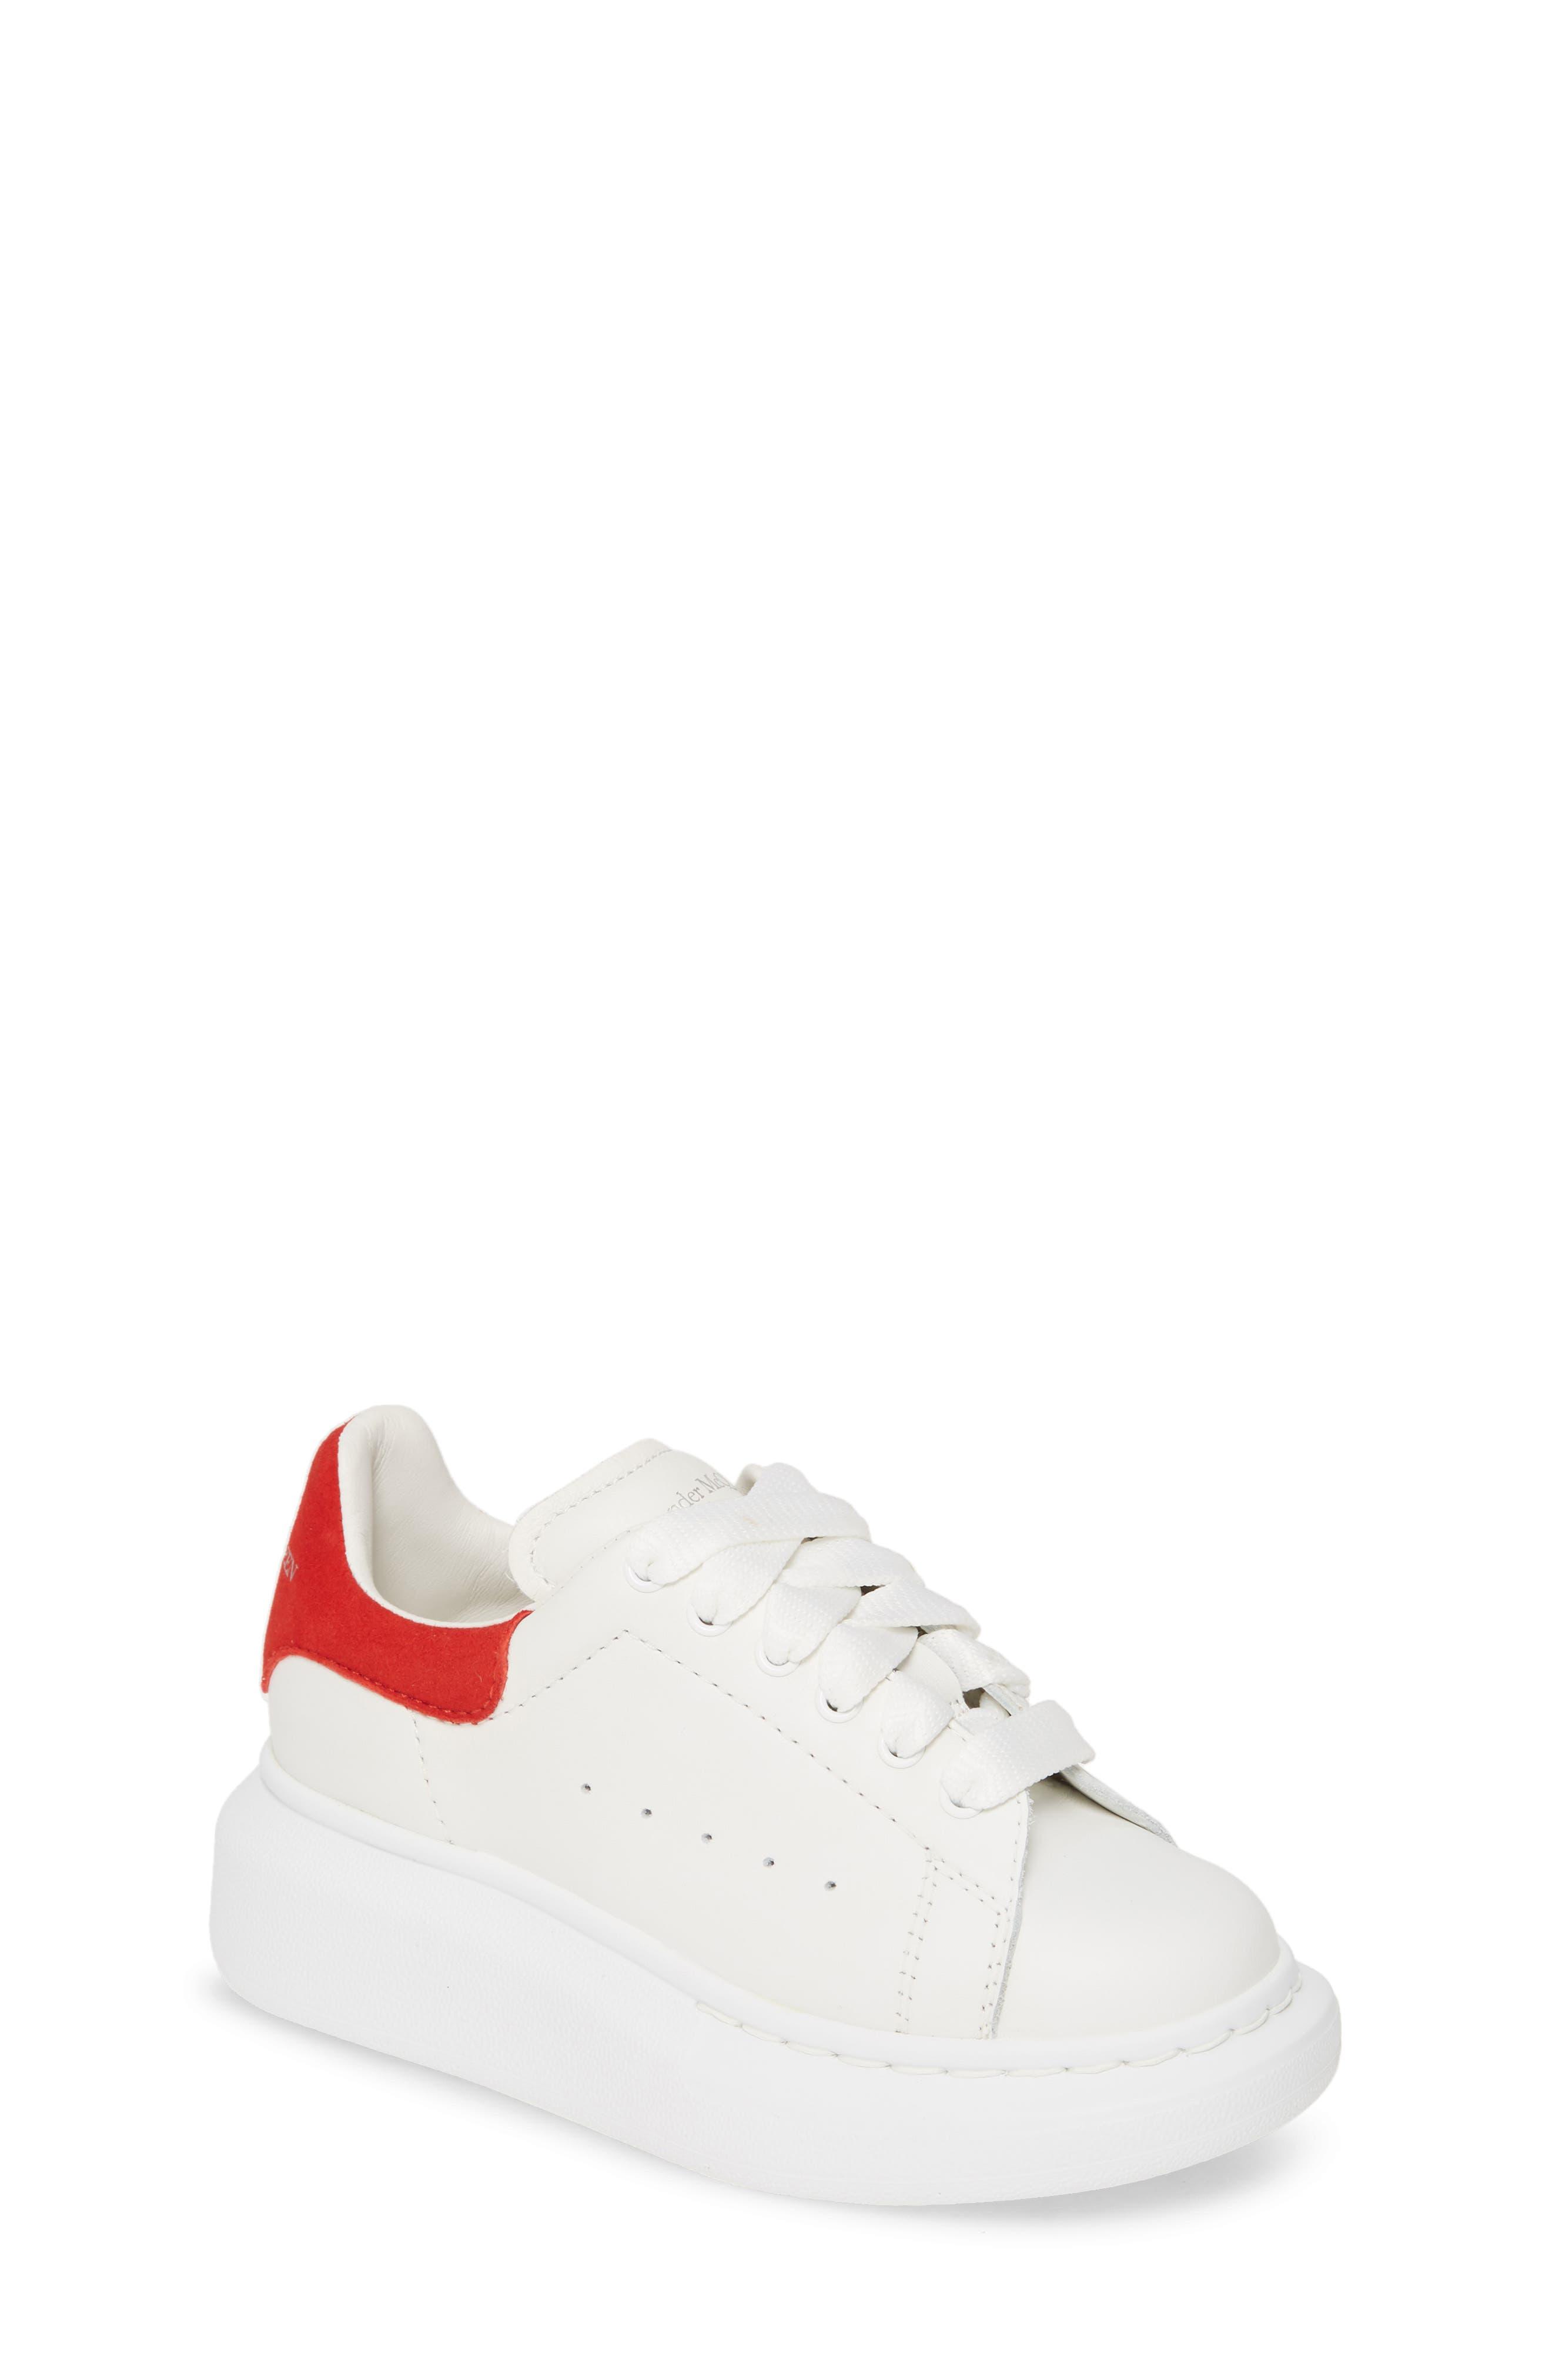 Toddler Alexander Mcqueen Oversize Sneaker Size 115US  29EU  White